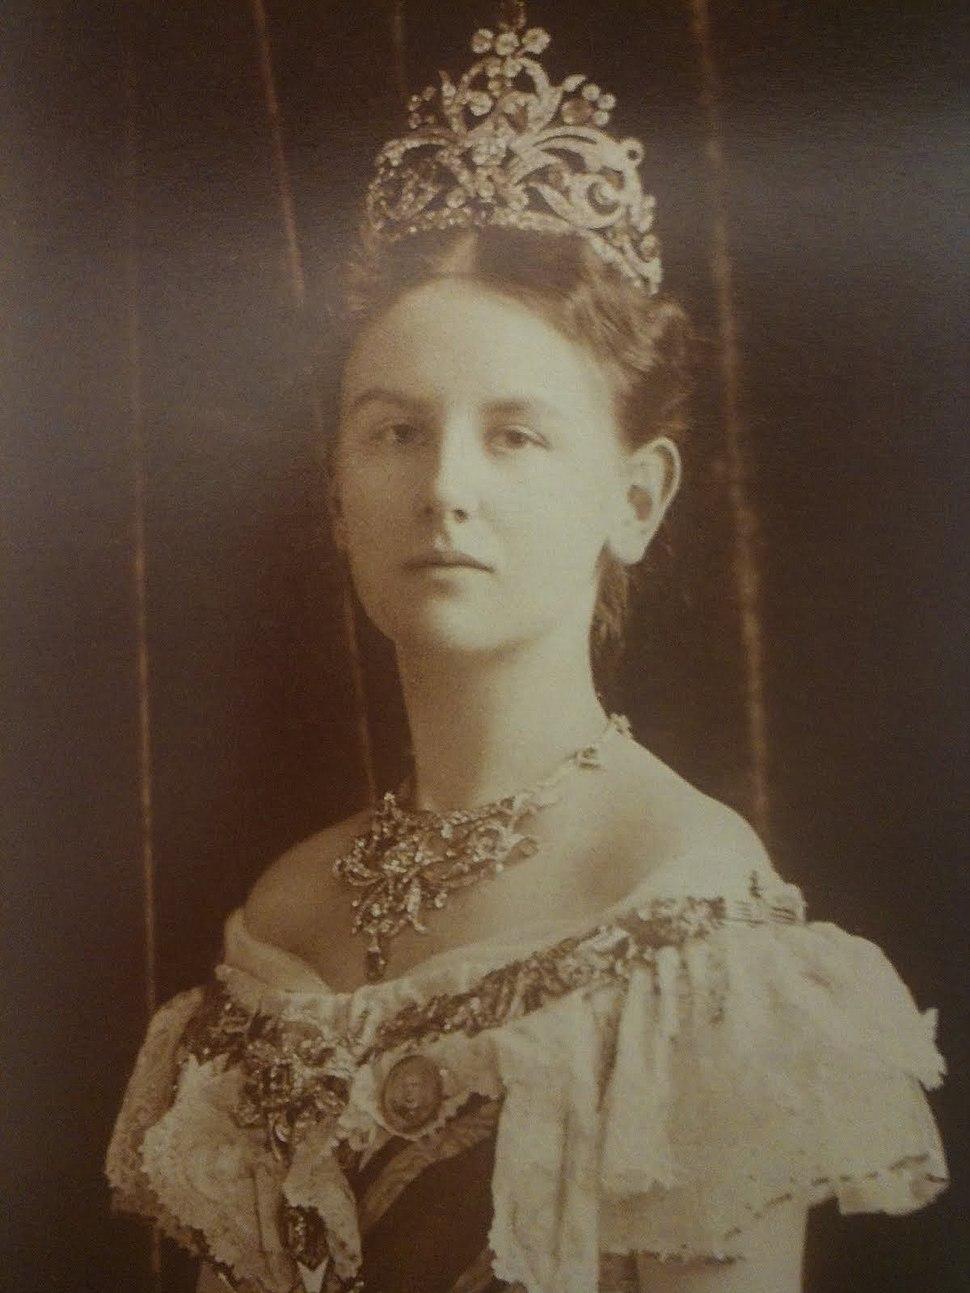 Wilhelmina as a young woman